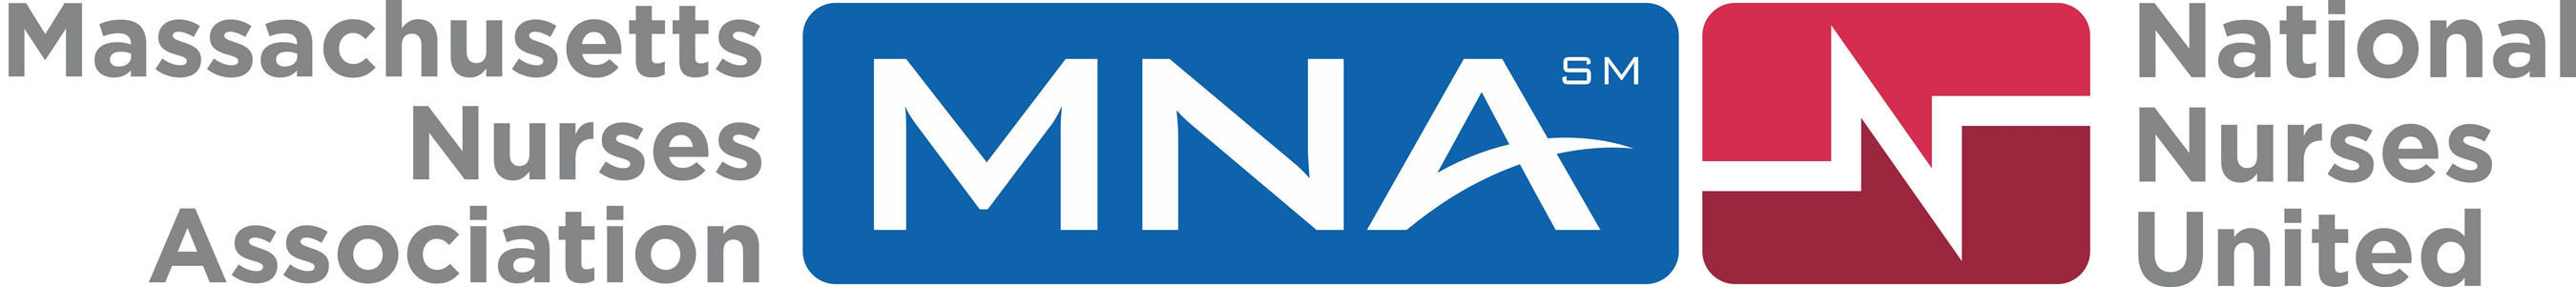 Massachusetts Nurses Association logo.